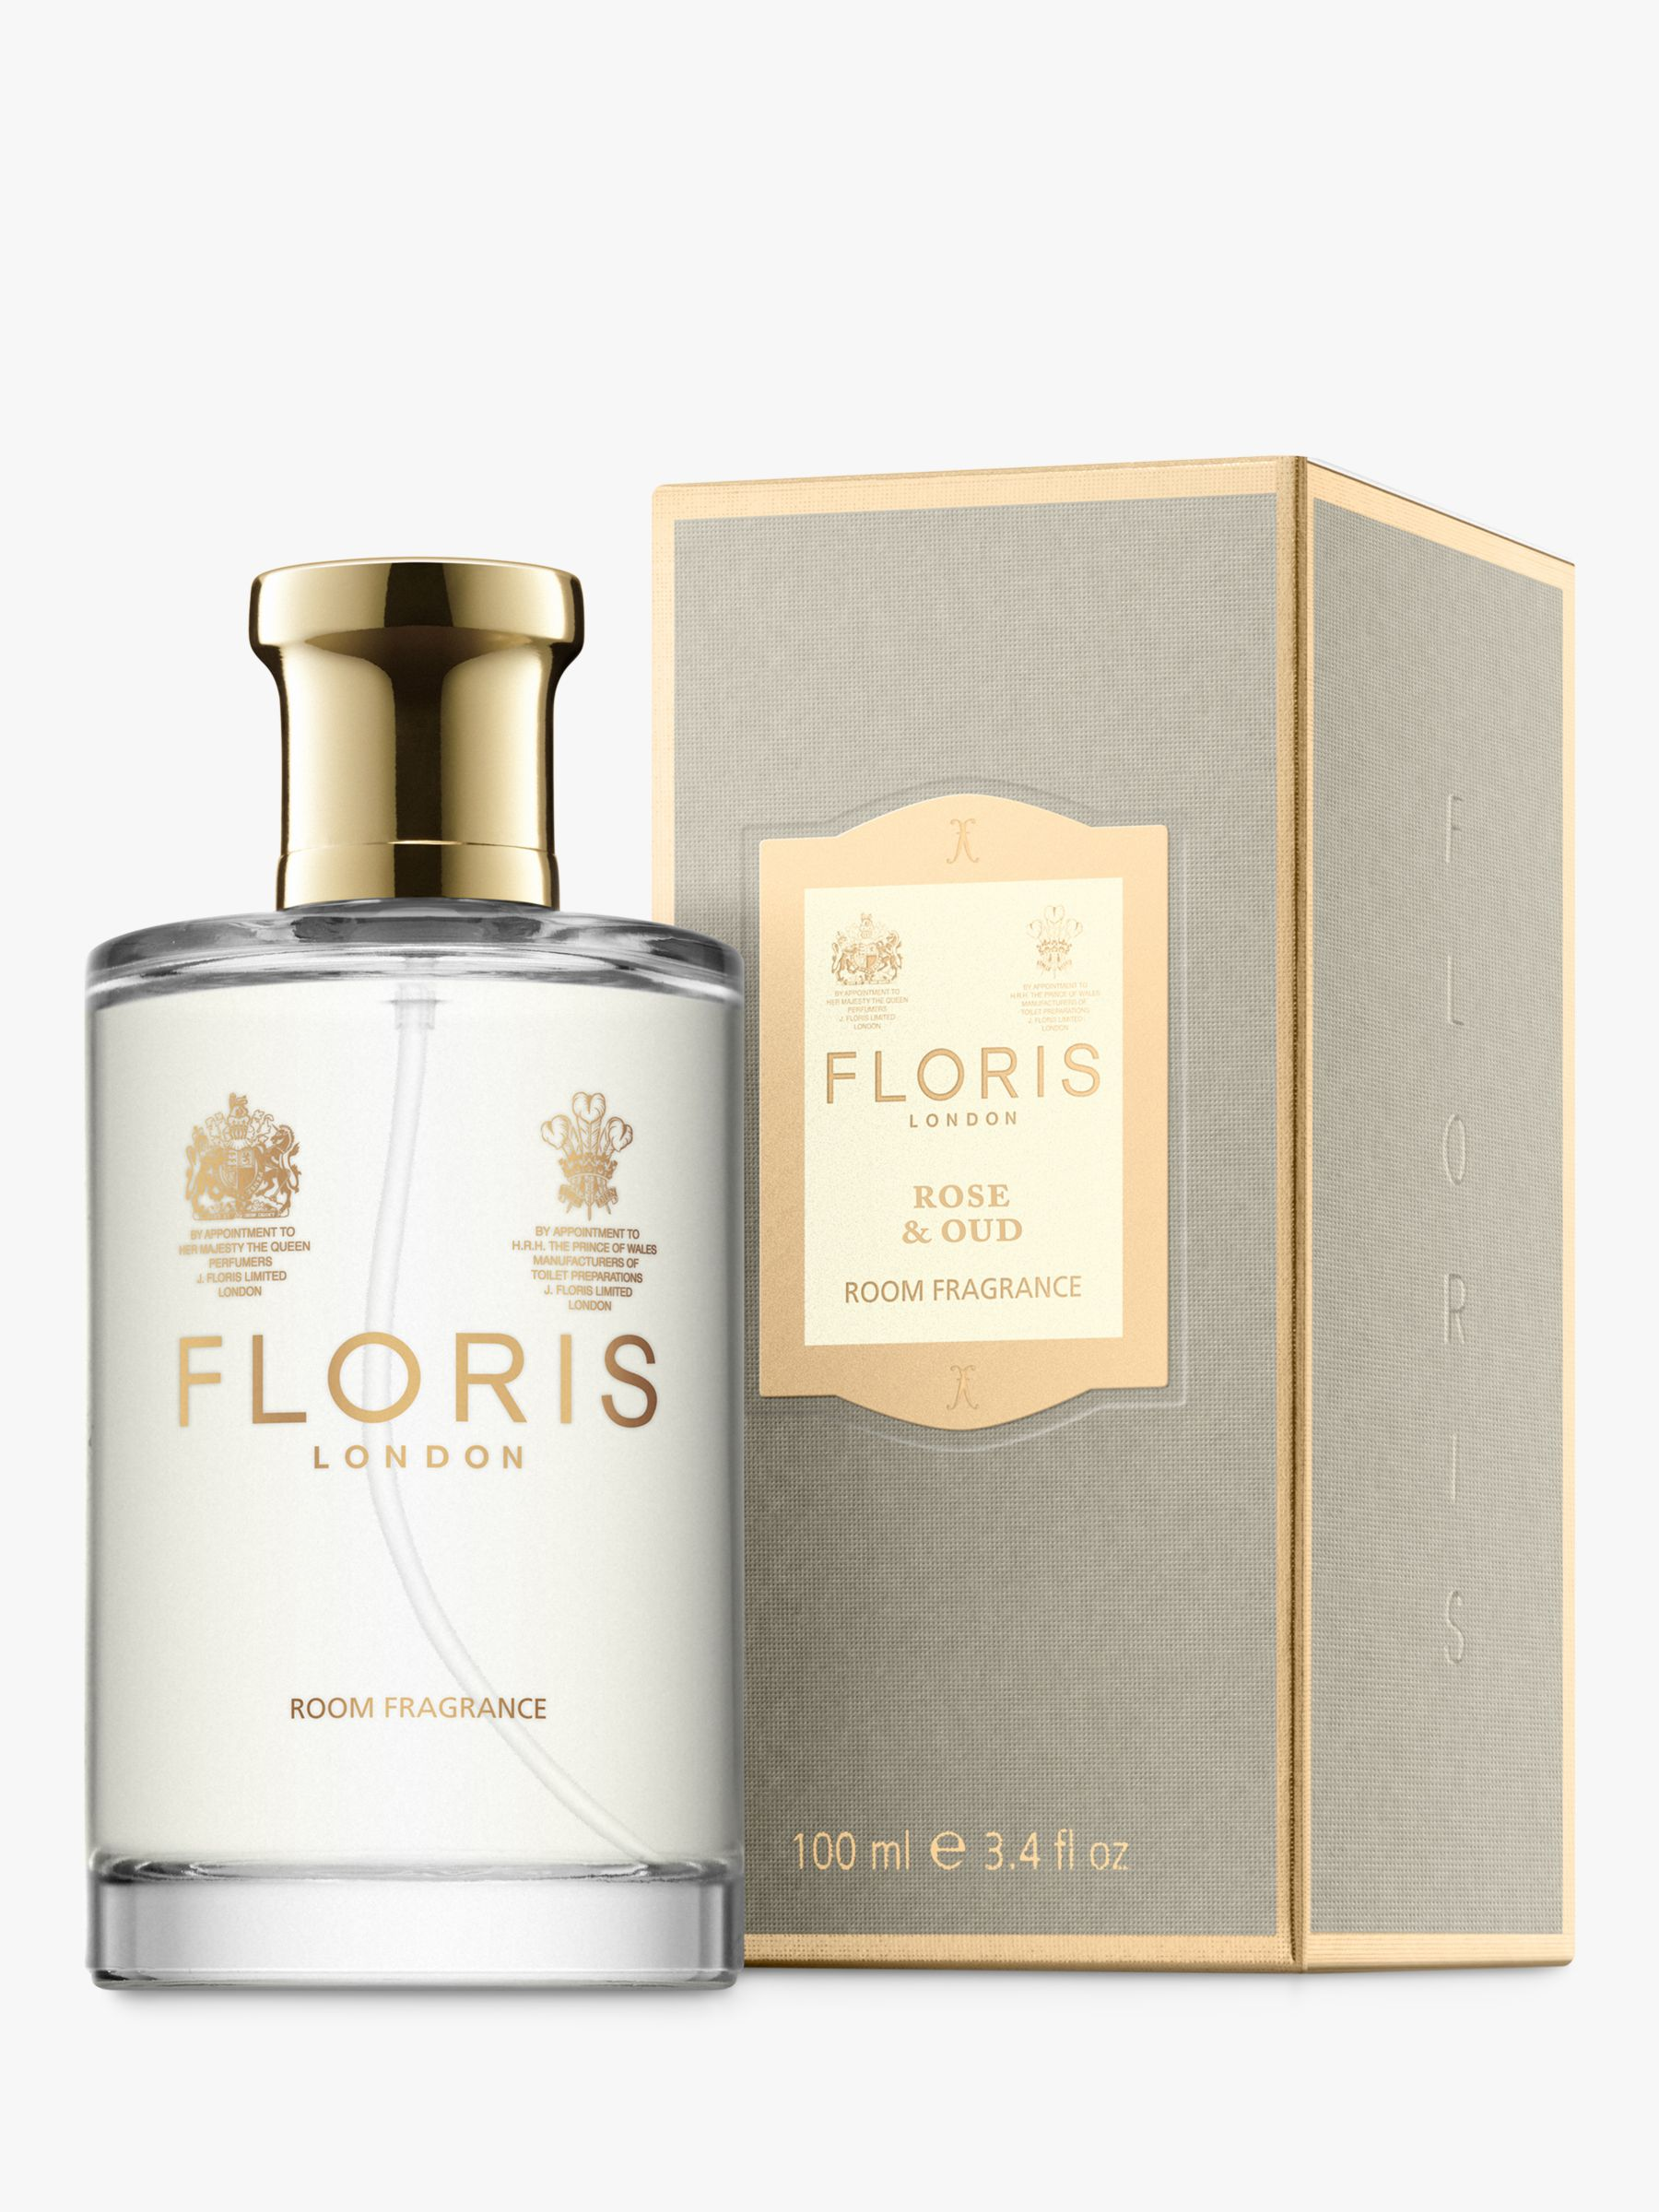 Floris Floris Rose & Oud Home Fragrance, 100ml